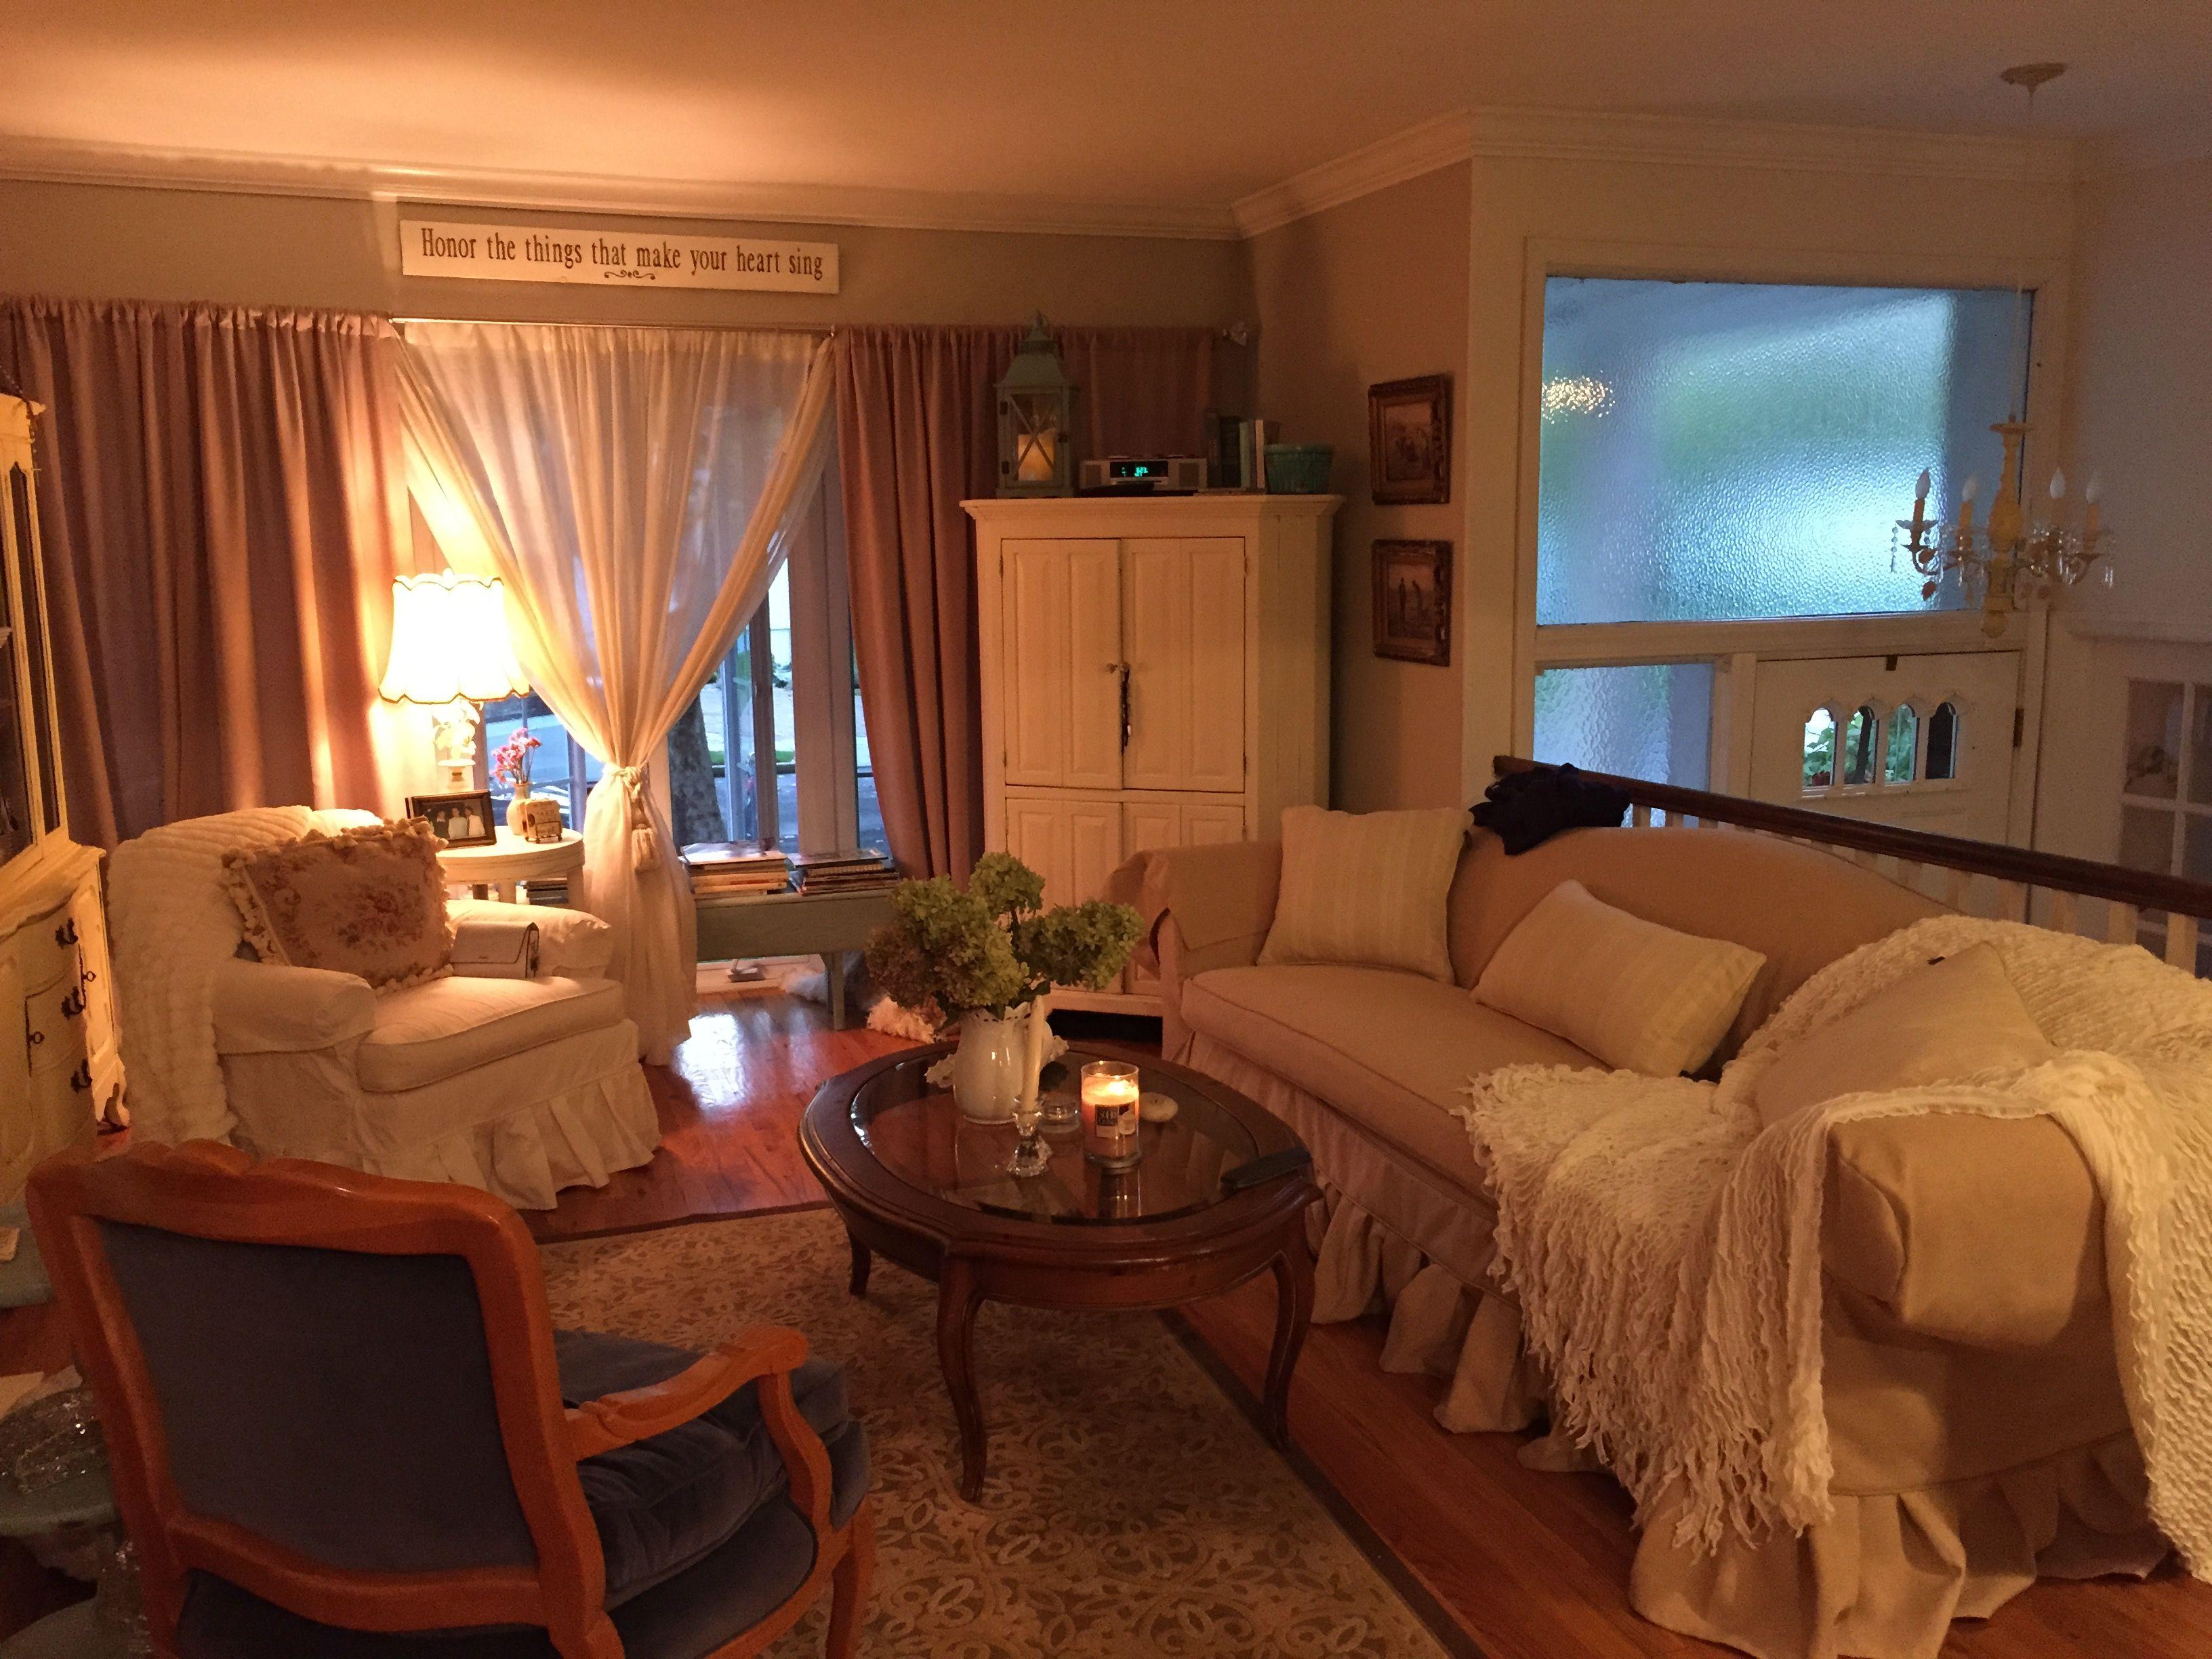 Comfy and cozy | Studio apartment decorating, Studio ...